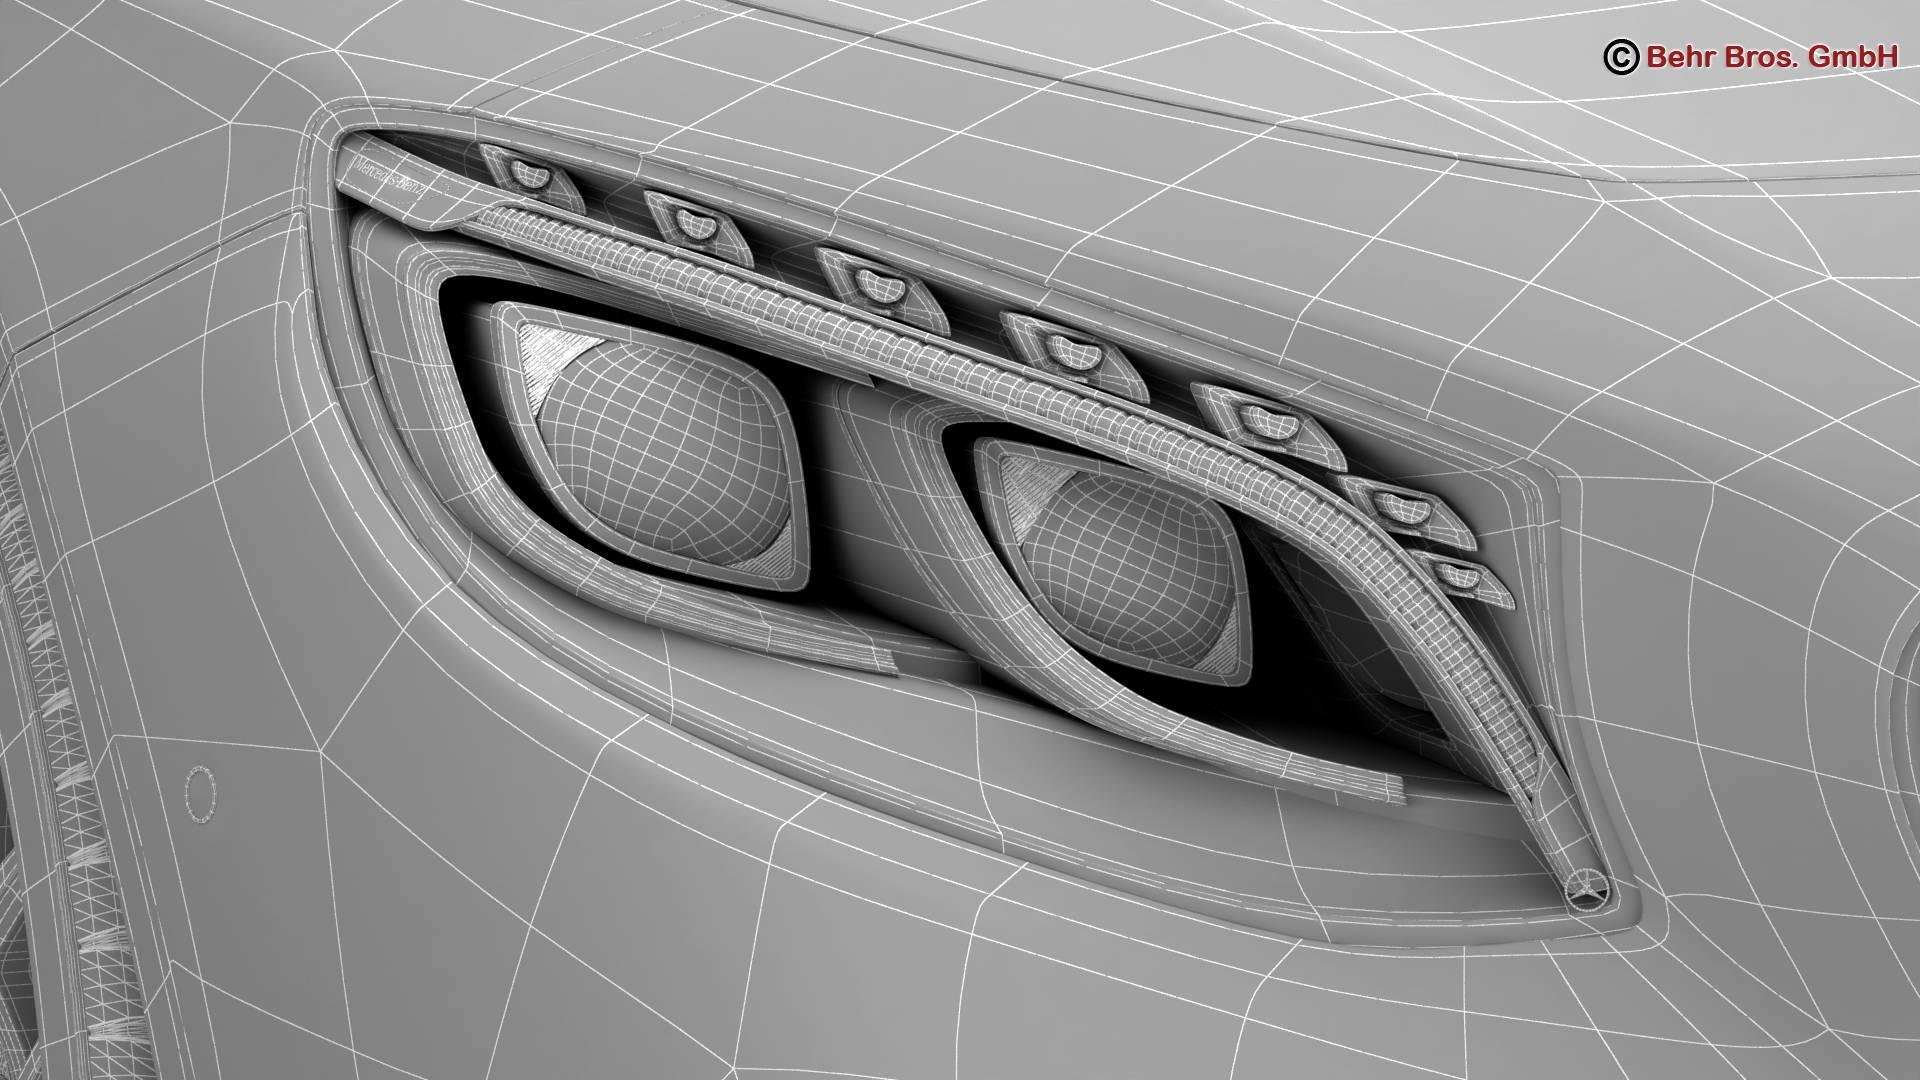 mercedes s klase kupeja s63 2018 3d modelis 3ds max fbx c4d lwo ma mb obj 274113